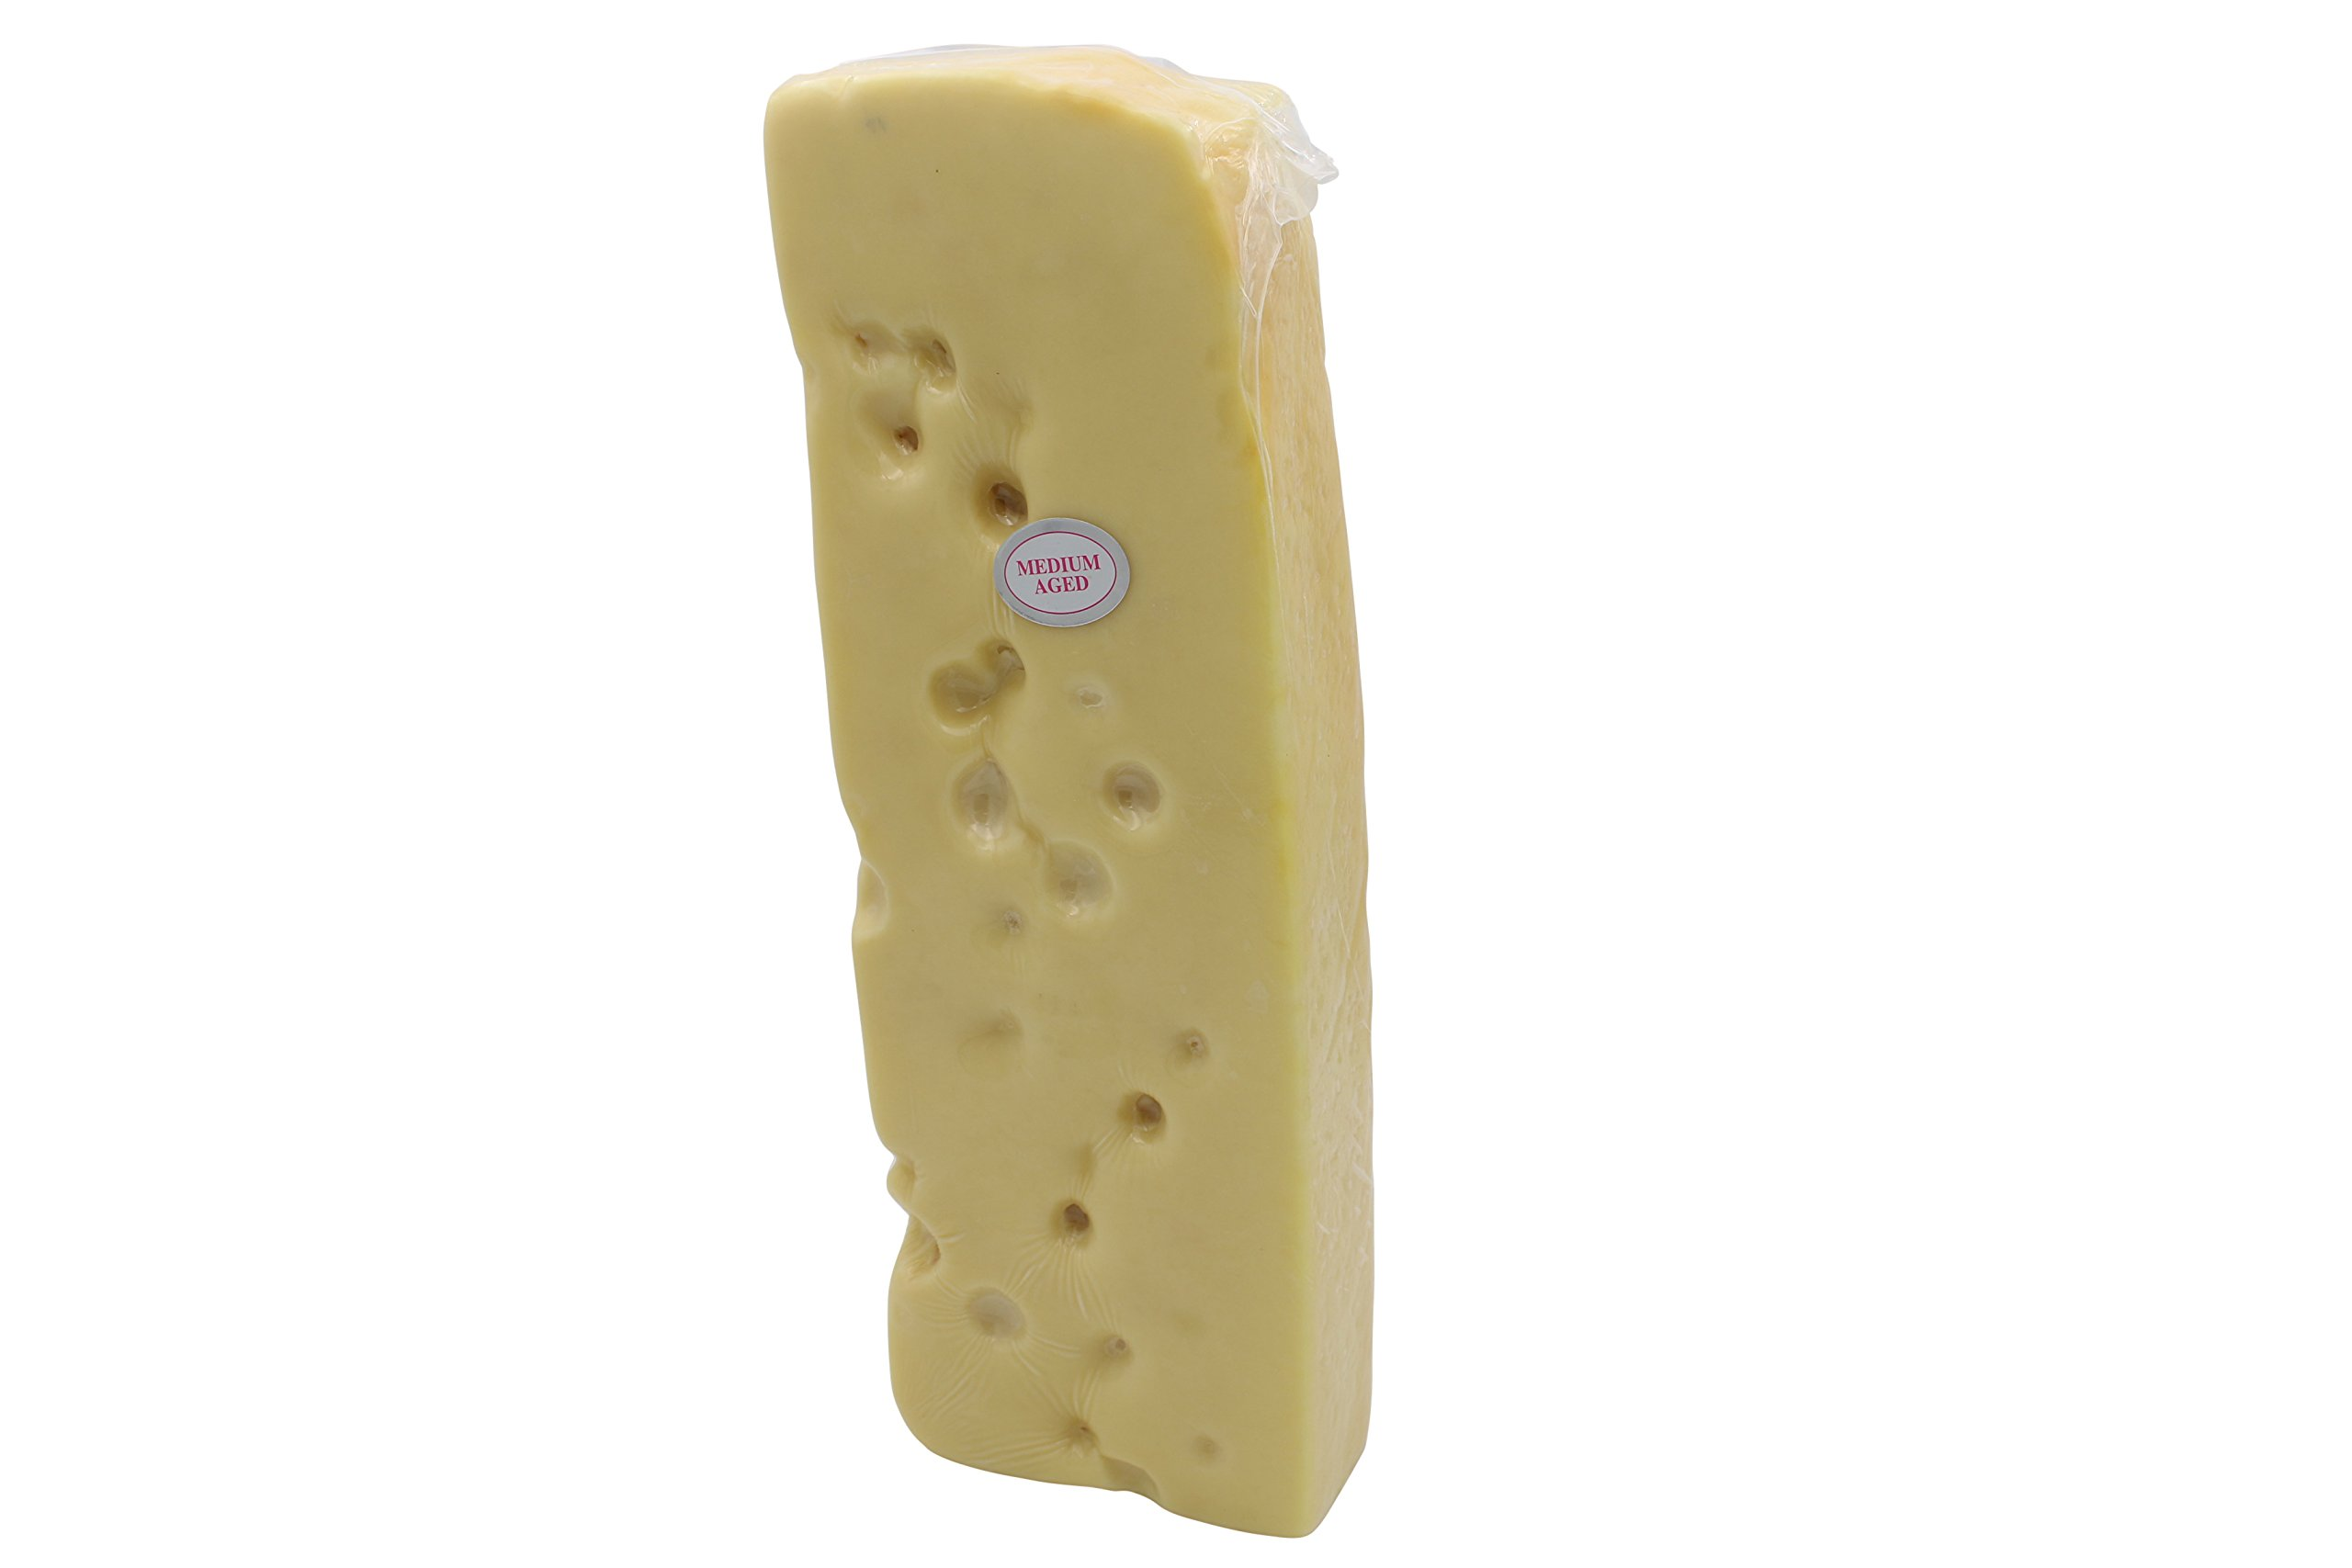 Shullsburg Creamery - Medium Aged Swiss Cheese - 7 Pound Loaf